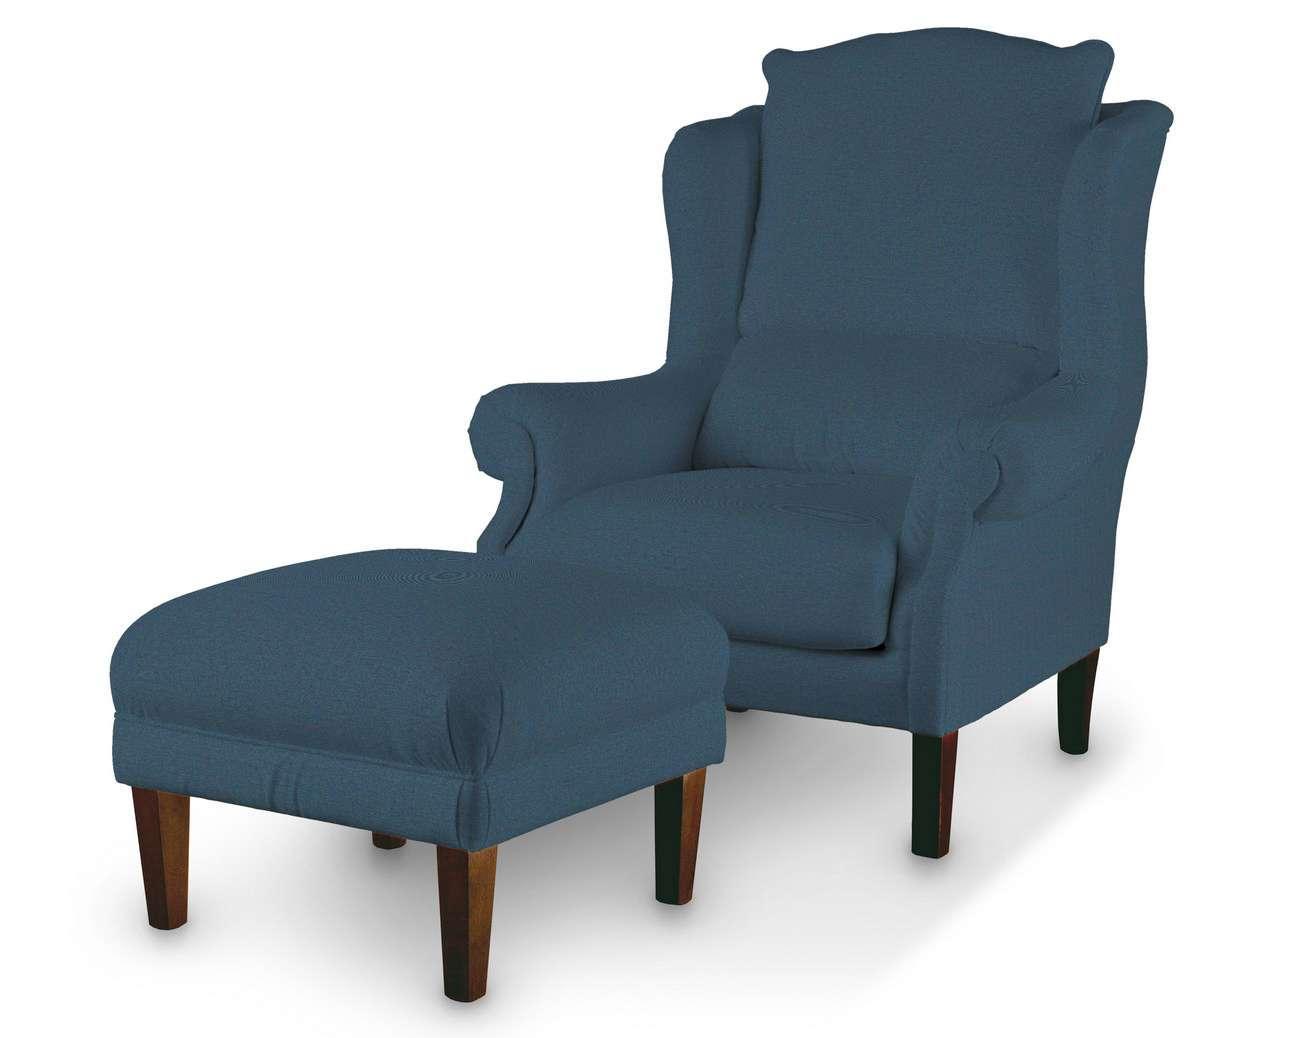 Podnóżek do fotela w kolekcji Etna, tkanina: 705-30